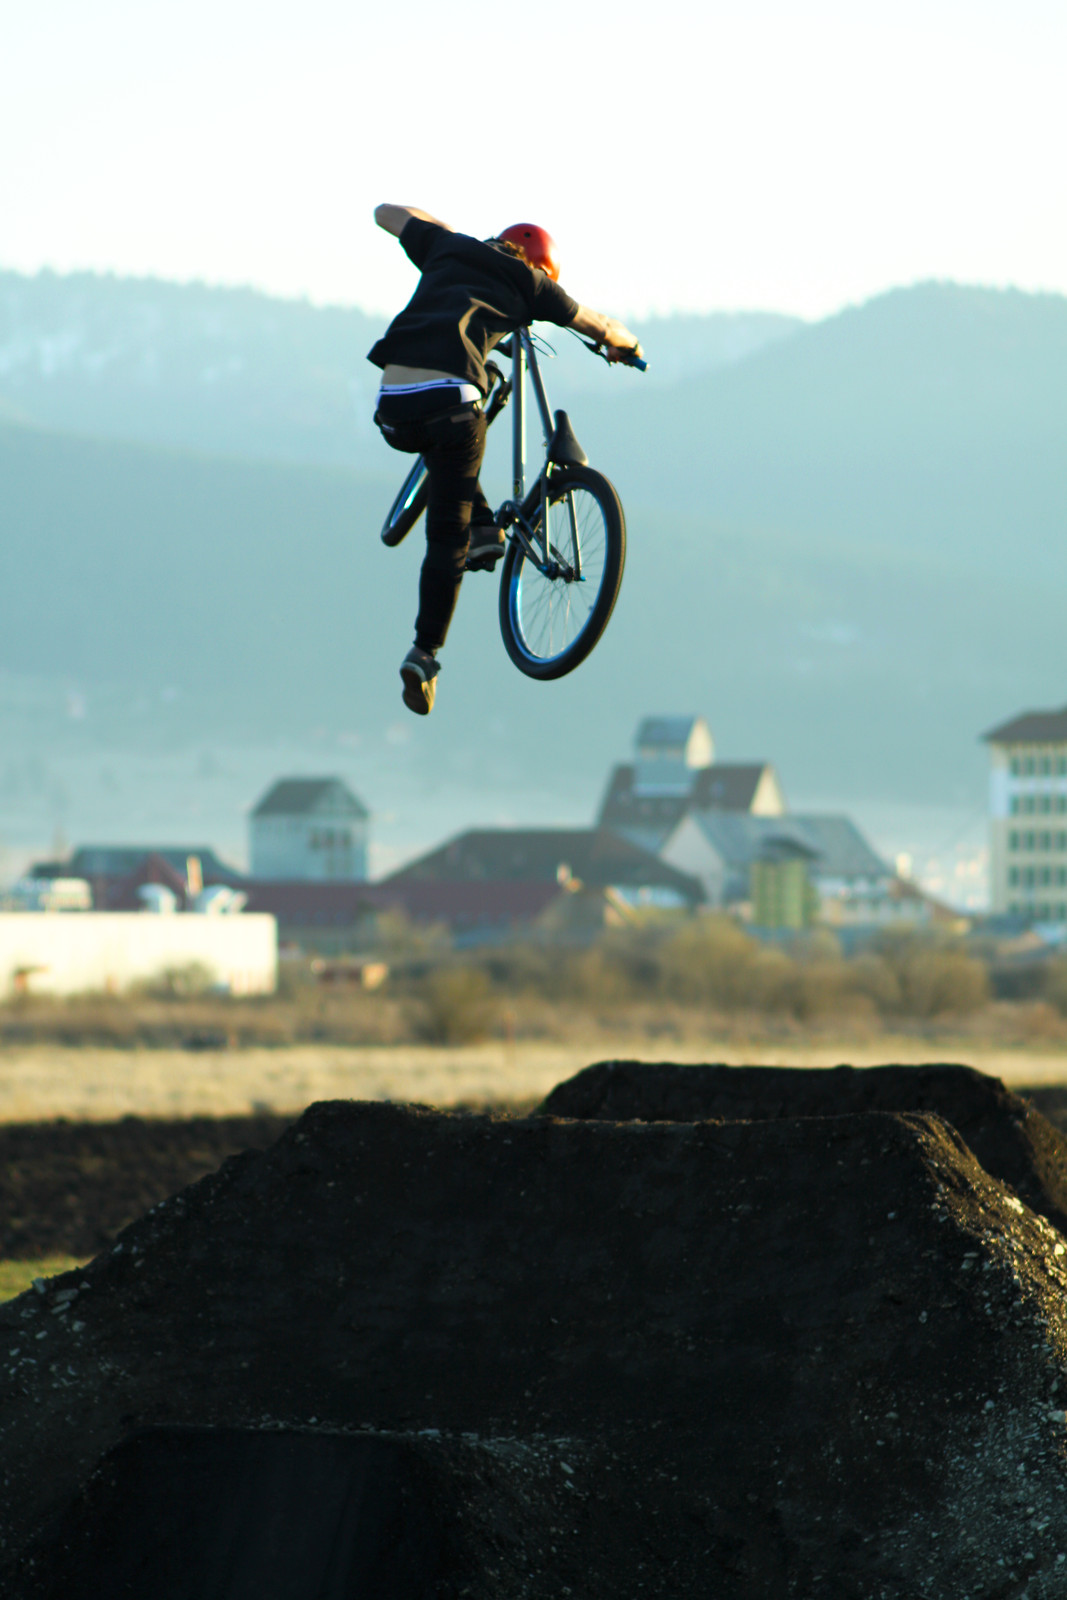 Nac-nac - Nándi - Mountain Biking Pictures - Vital MTB